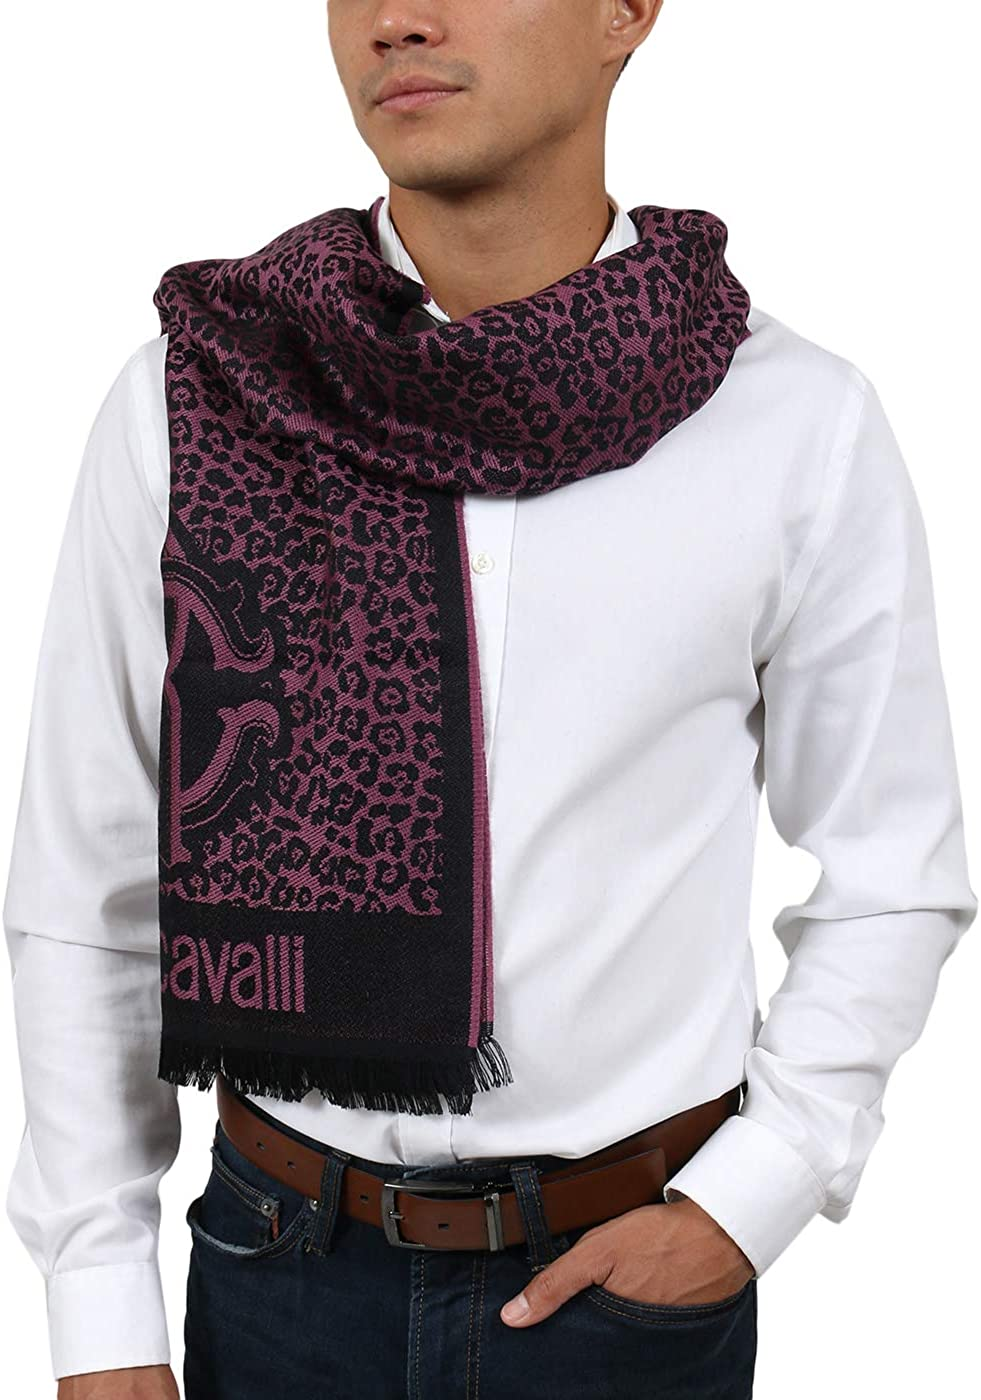 Roberto Cavalli ESZ056 03000 Purple Wool Blend Leopard Print Mens Scarf for mens